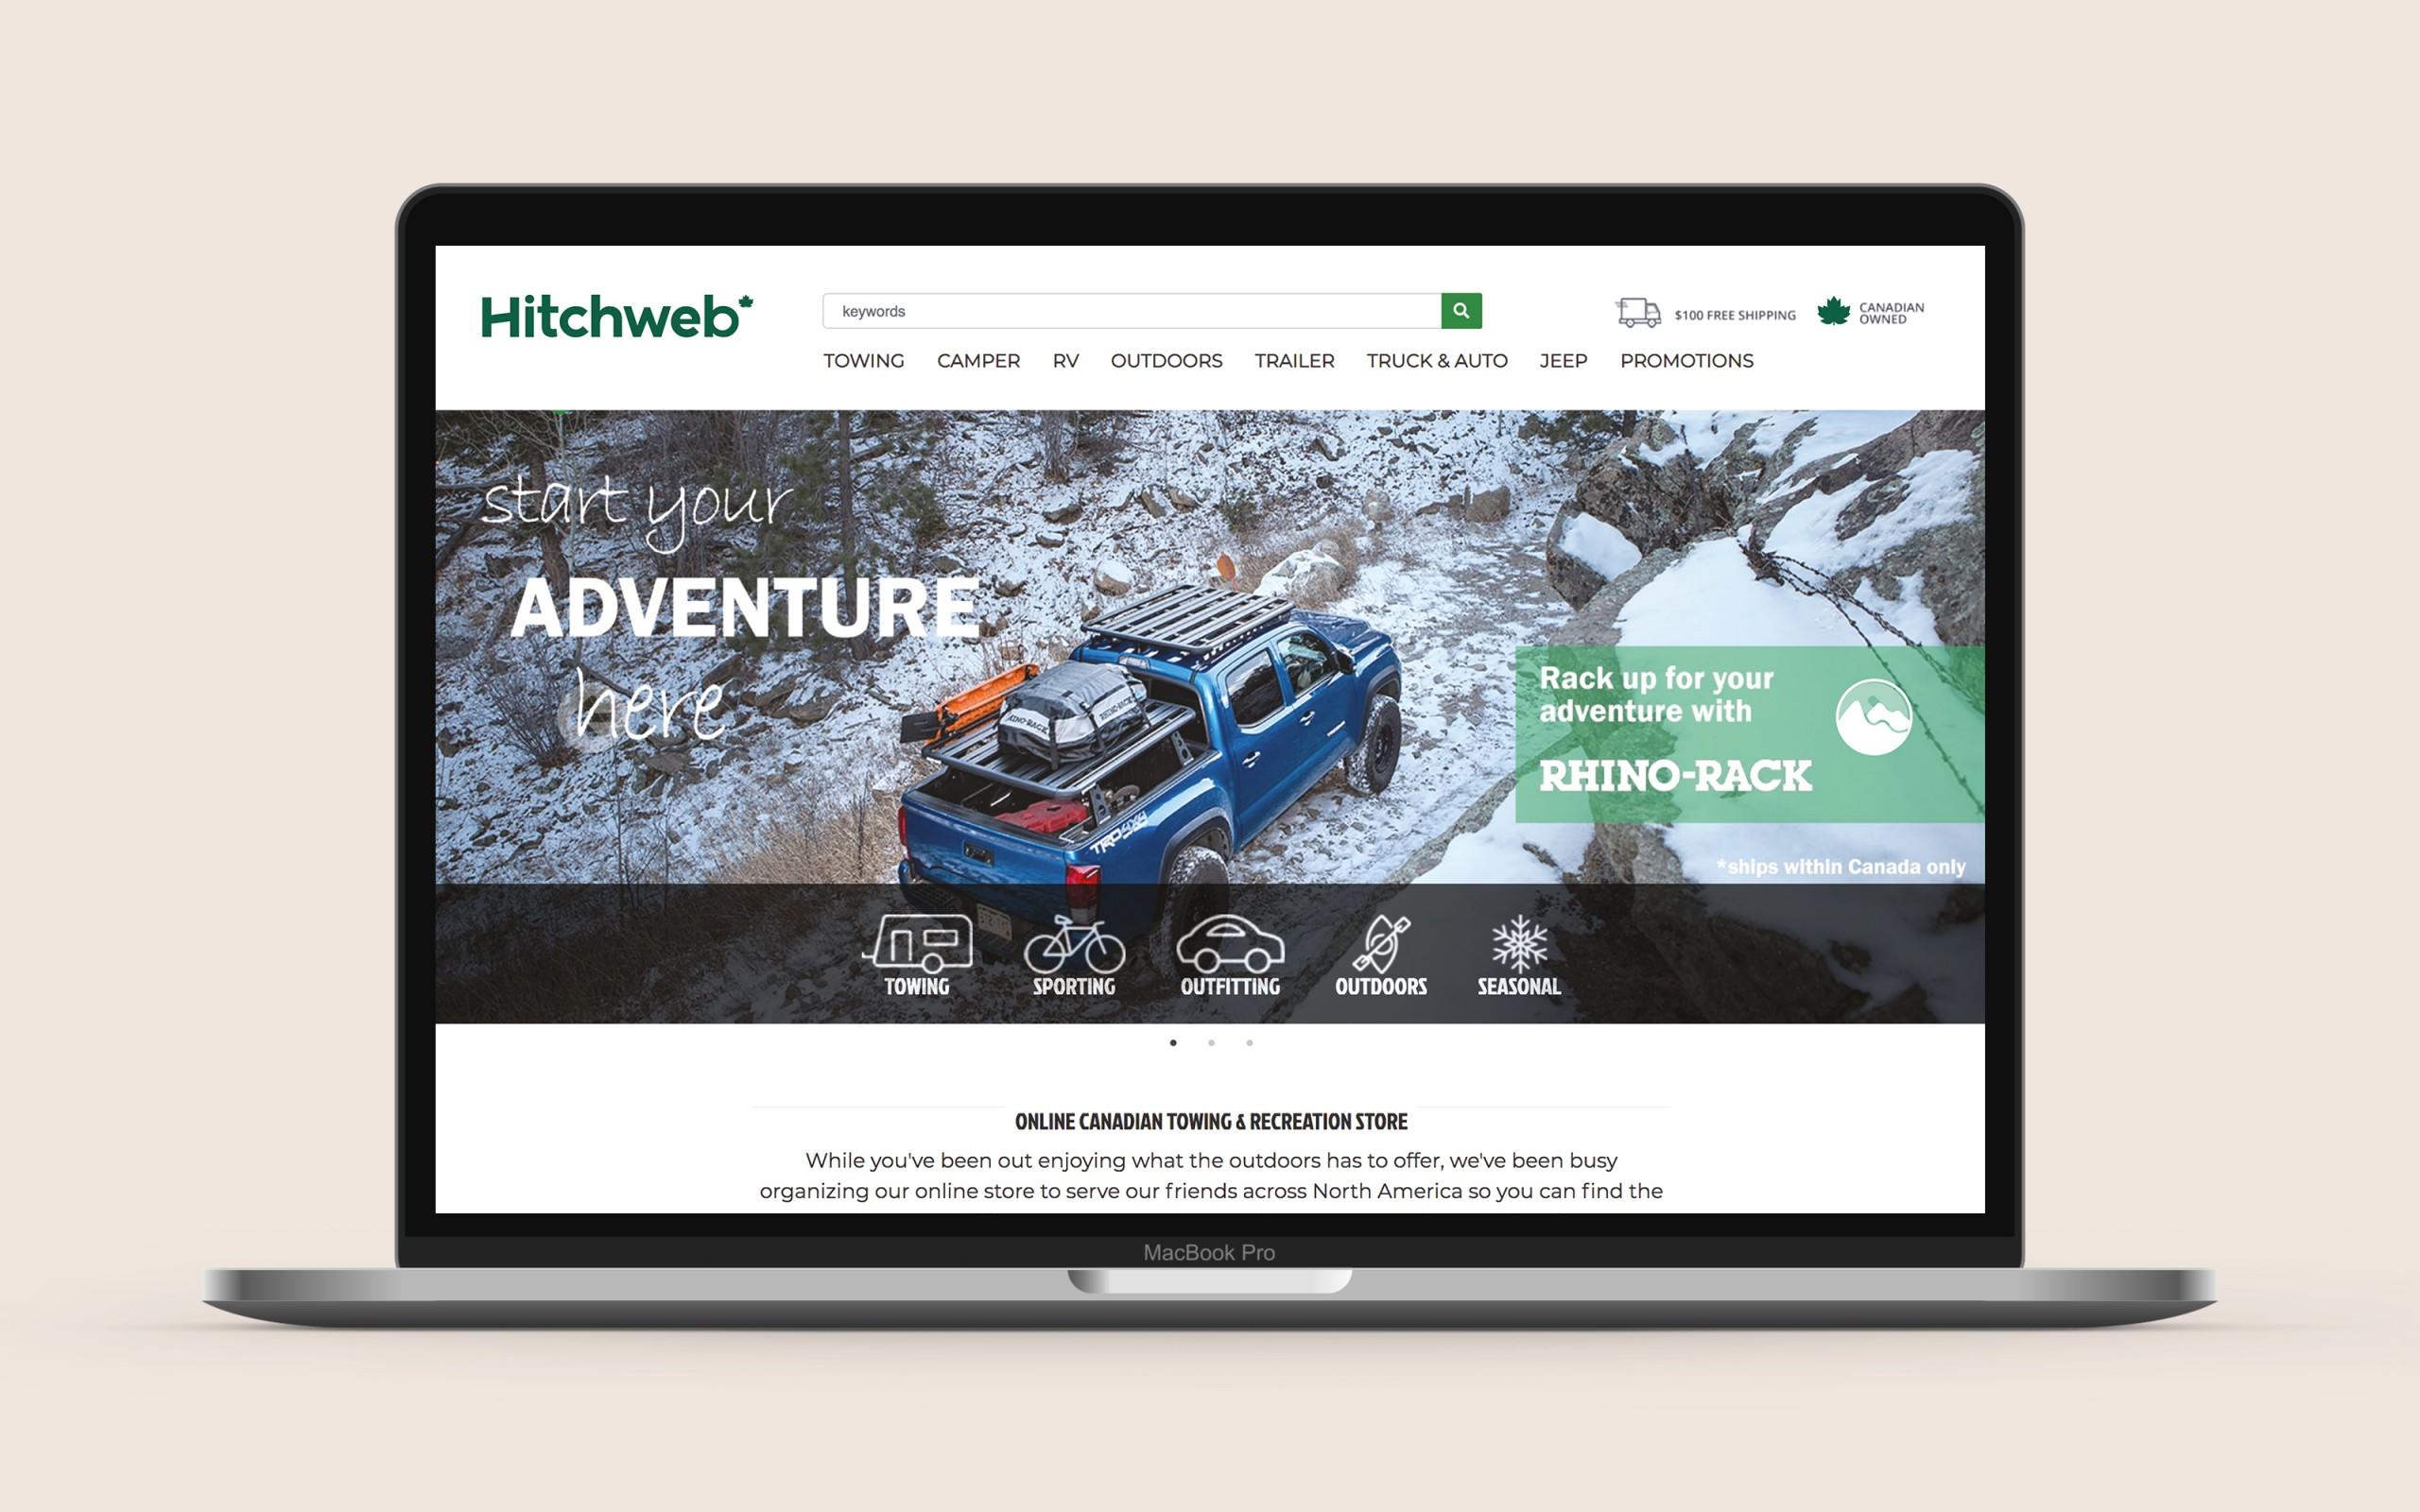 Mockup of a Hitchweb website.